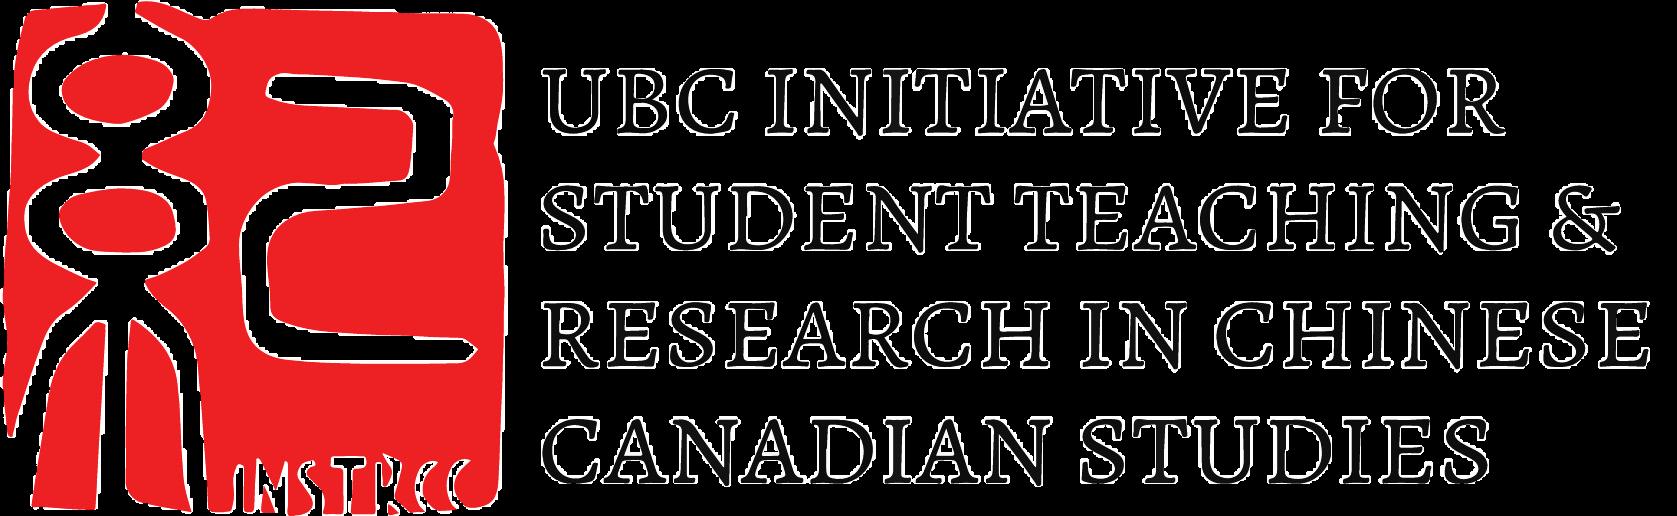 UBC INSTRCC